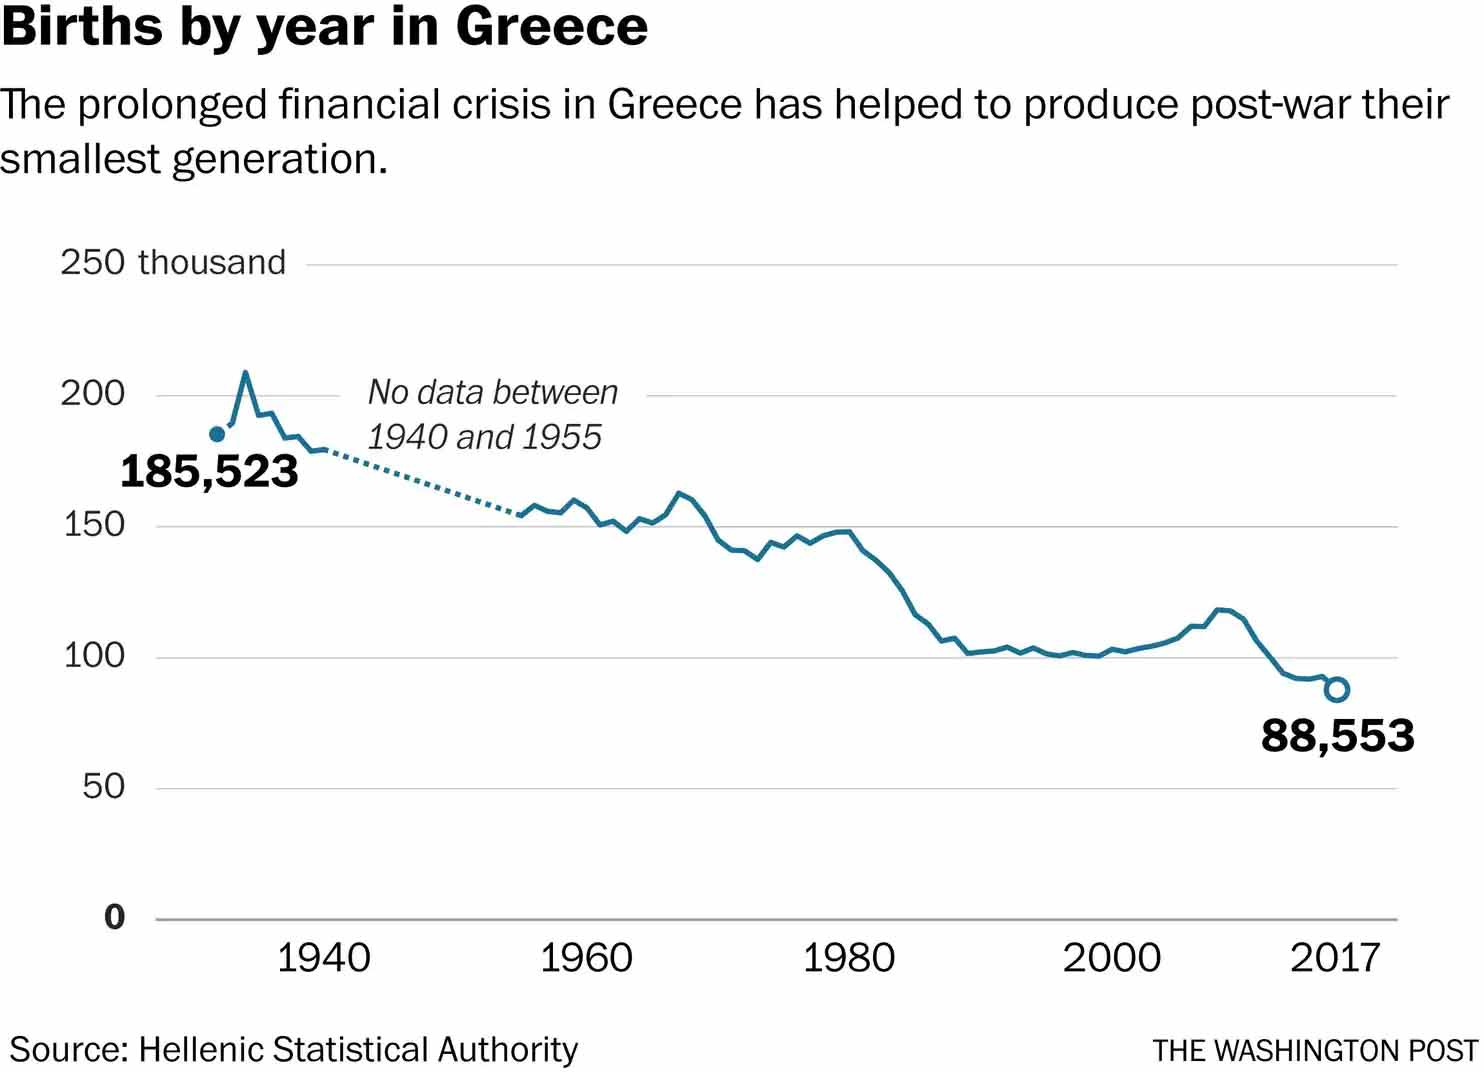 Washington Post: Πού πήγαν όλα τα παιδιά στην Ελλάδα; -Πώς η κρίση έβαλε «φρένο» στις γεννήσεις στην Ελλάδα